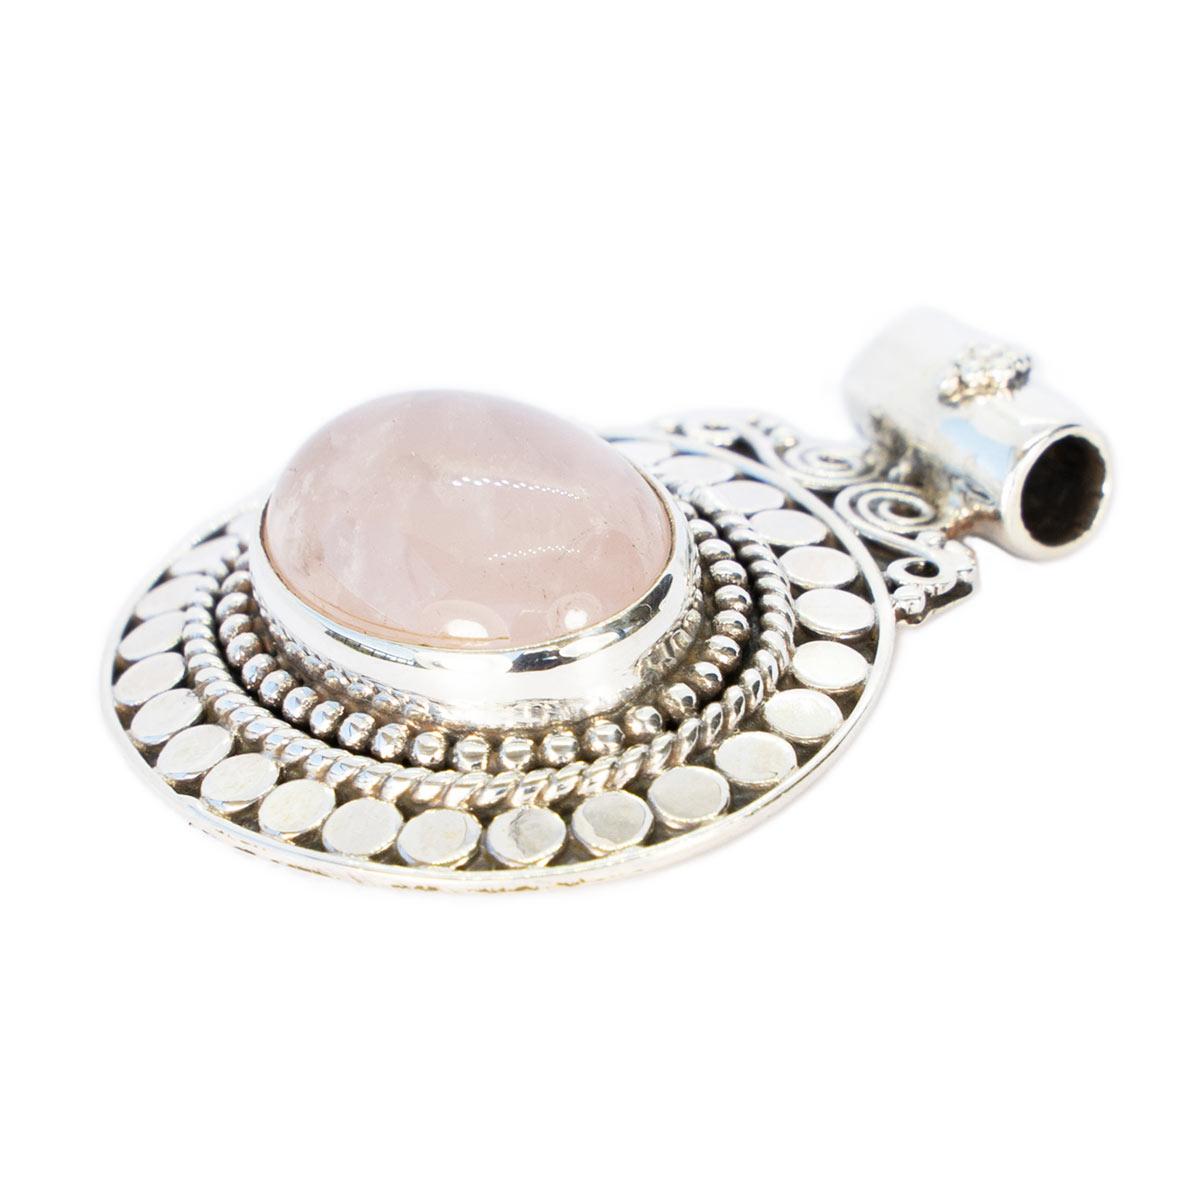 Sri Avinash Infused™ Rose Quartz Pendant - Divine Blessings Infusion